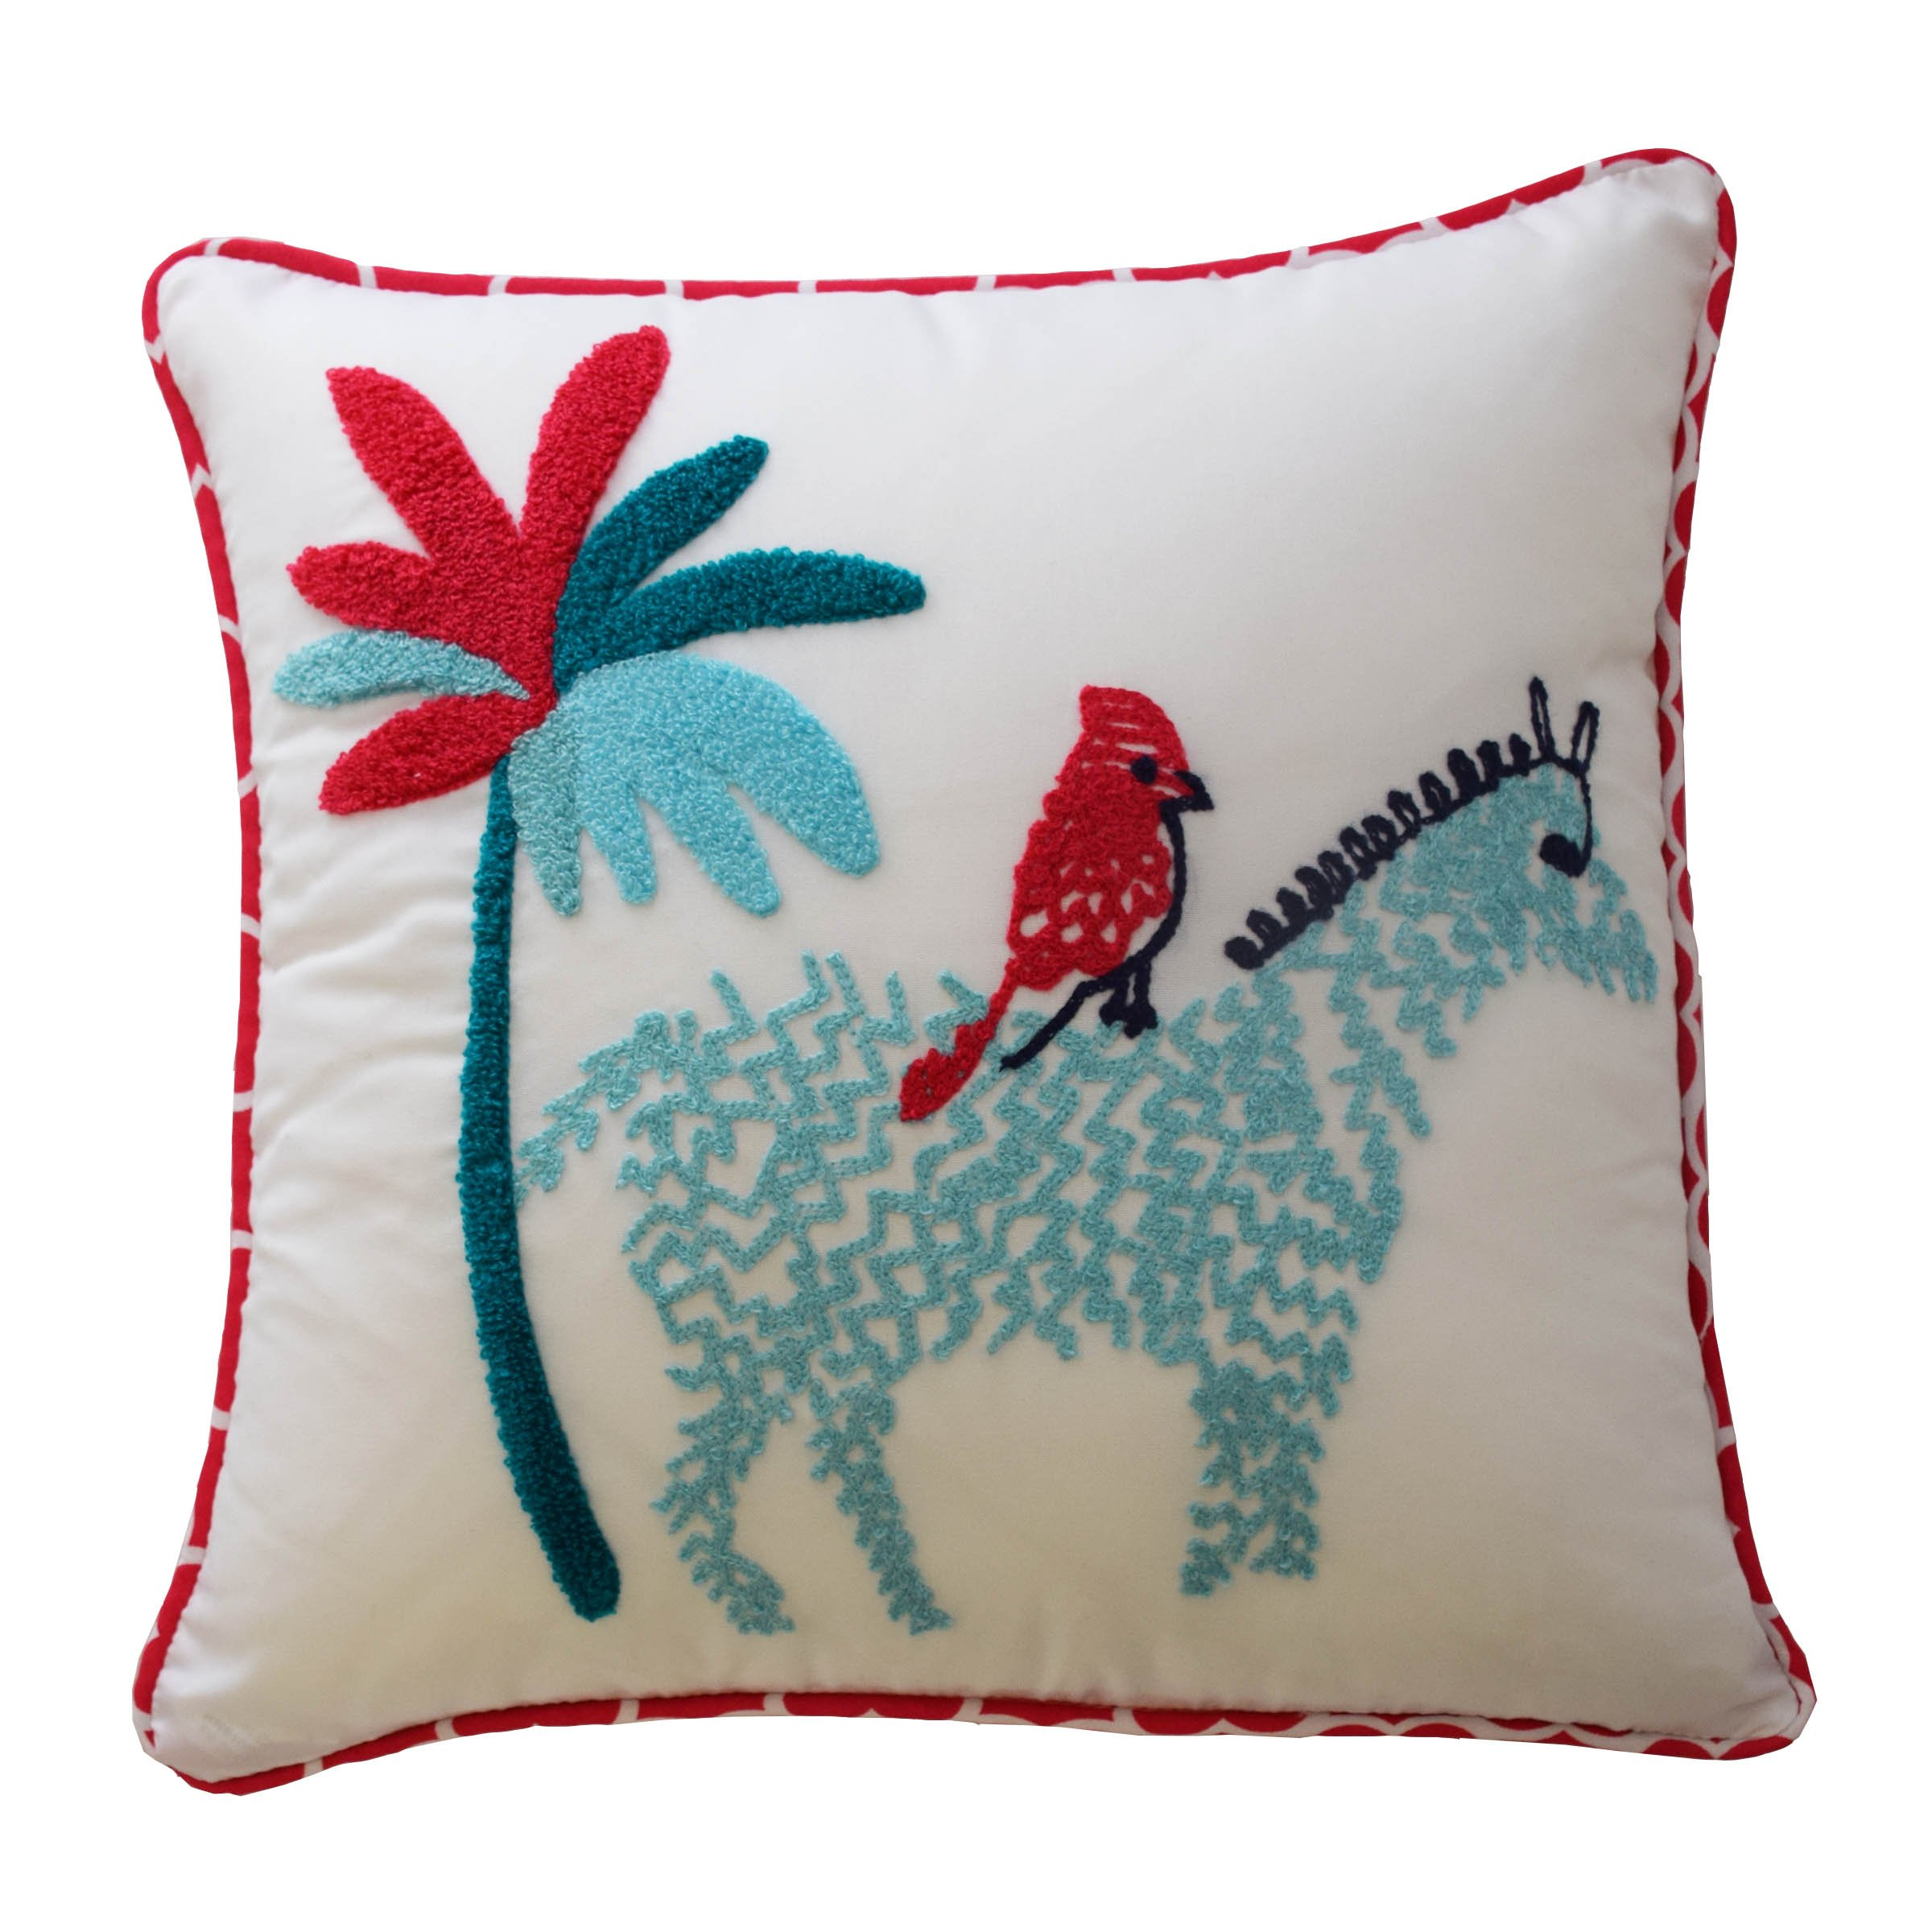 WAVERLY Kids 16441015X015PNK Reverie 15-inch by 15-inch Zebra Decorative Accessory Pillow, Pink